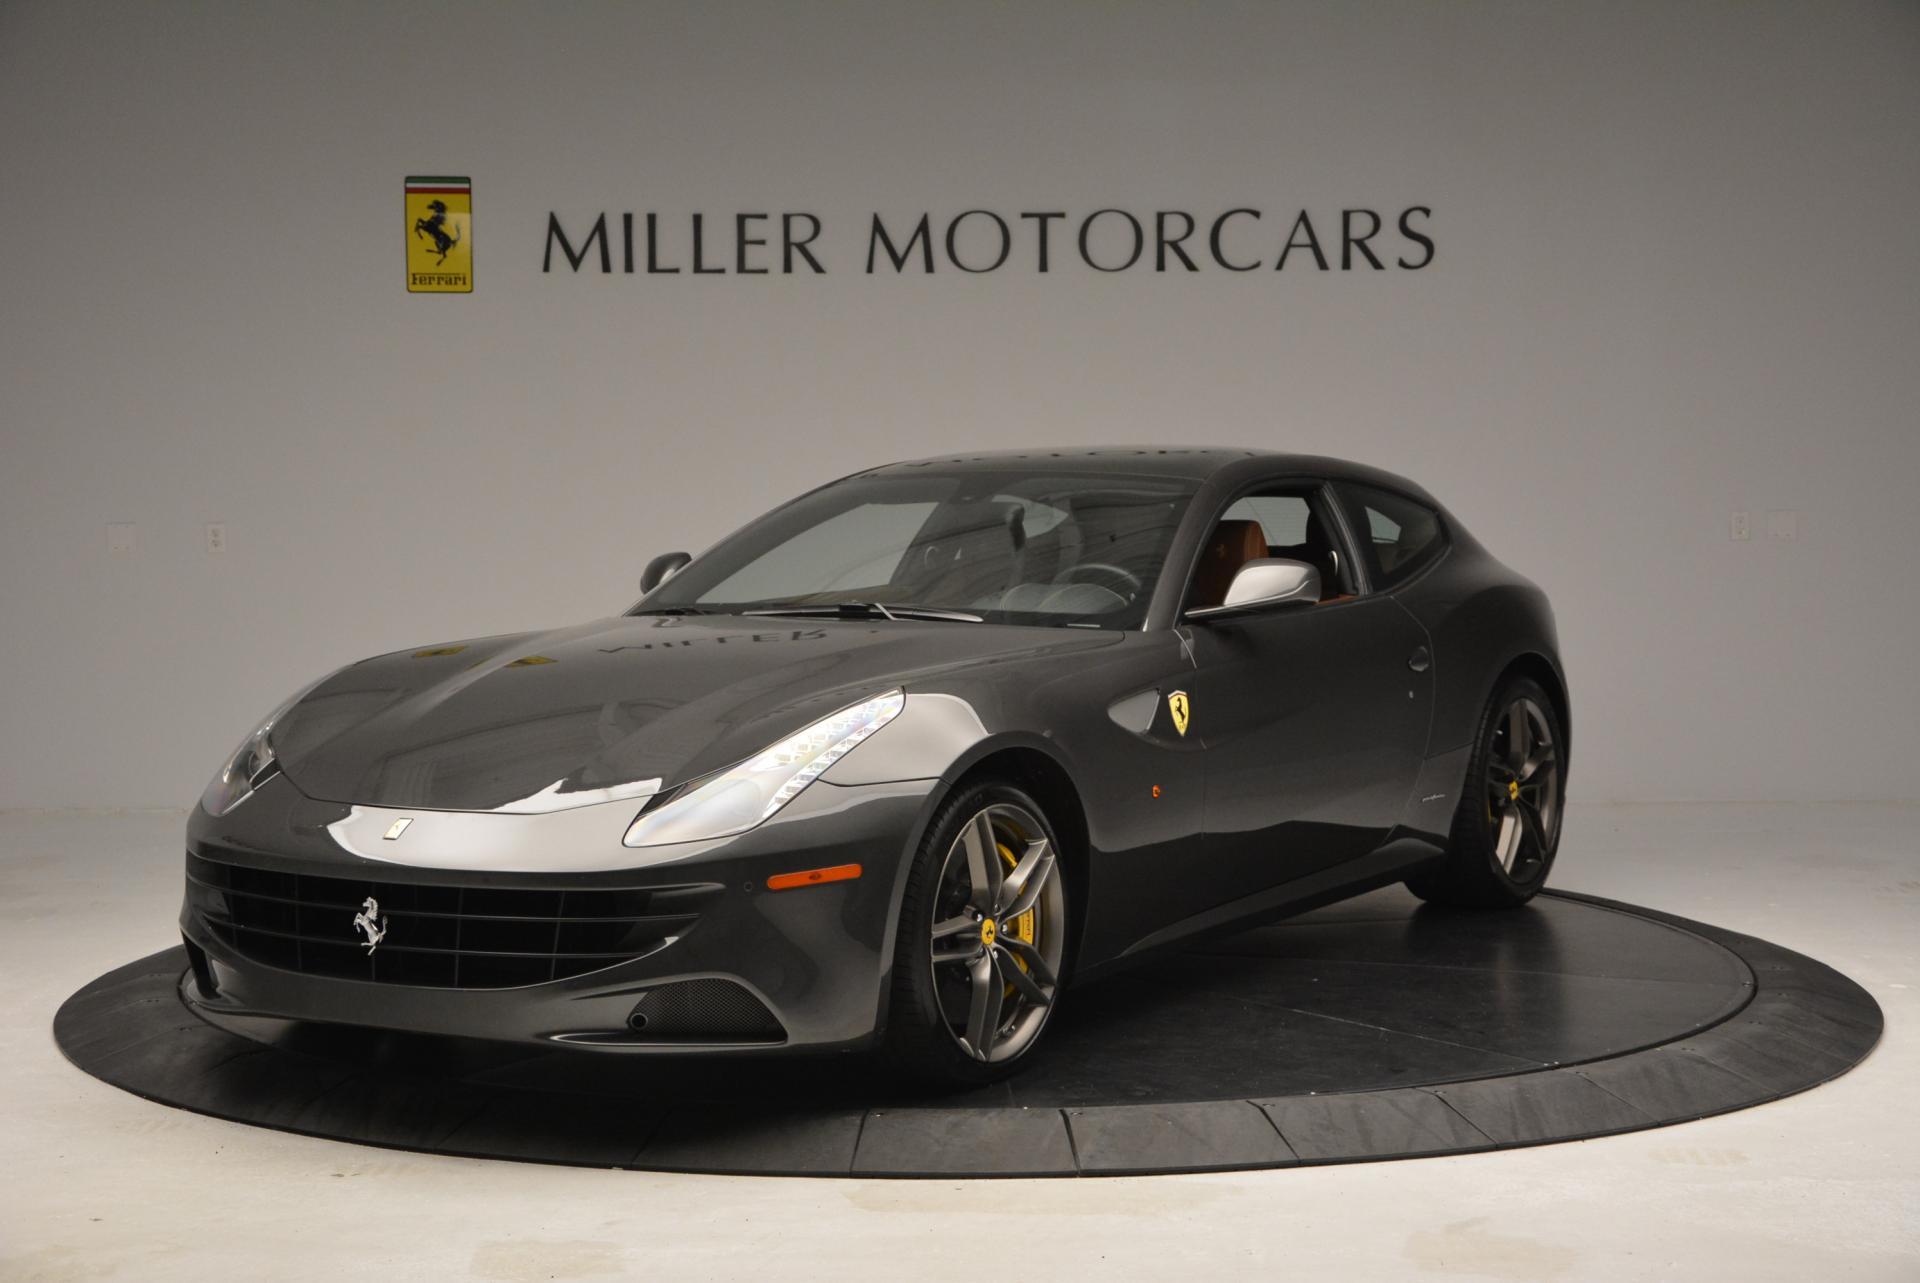 Miller motorcars maserati lease specials autos post